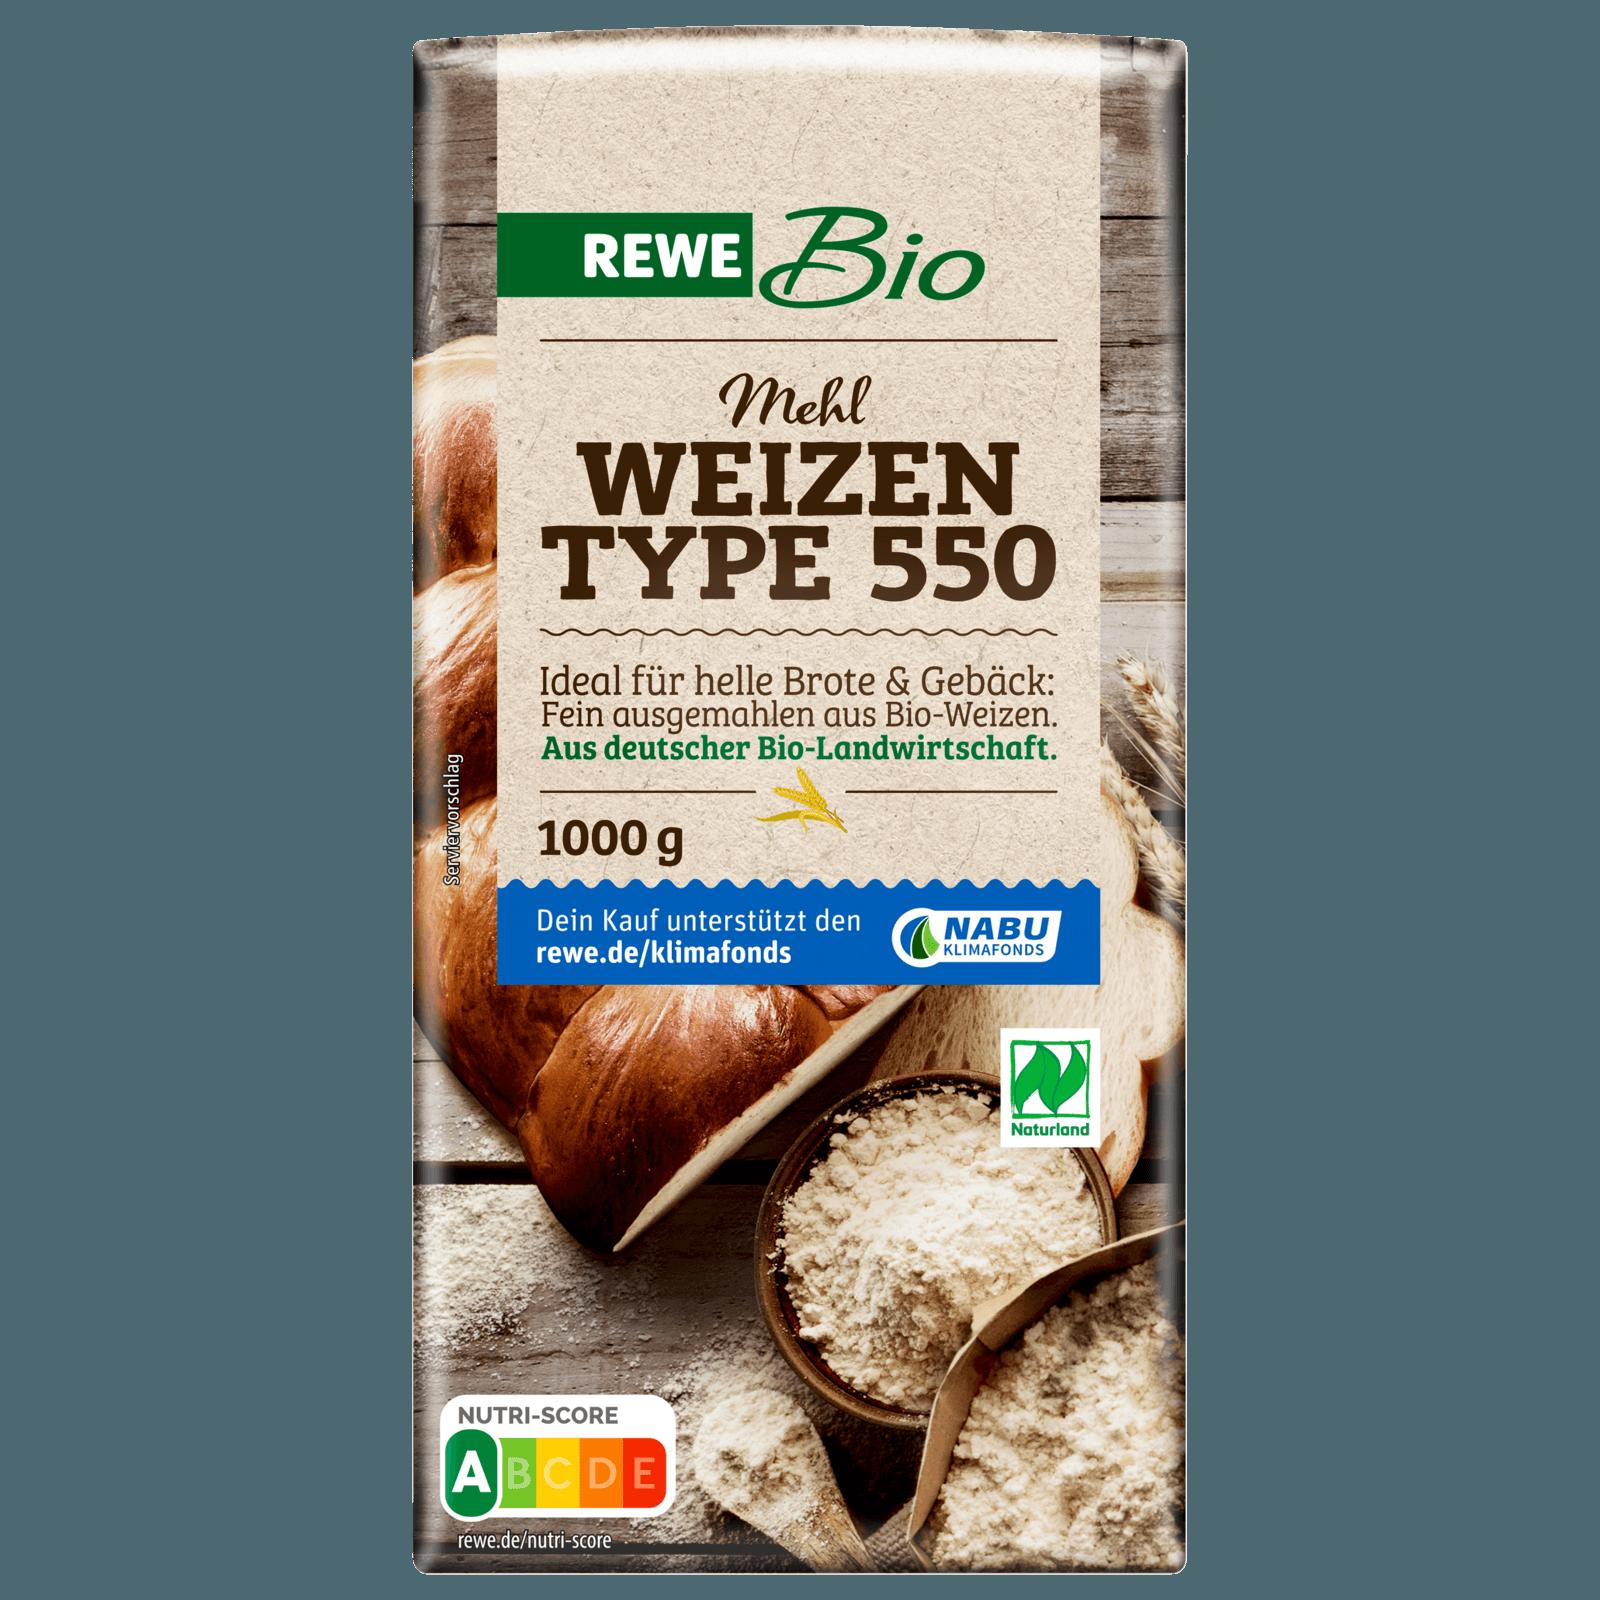 Rewe Bio Weizenmehl Type 550 1kg Bei Rewe Online Bestellen